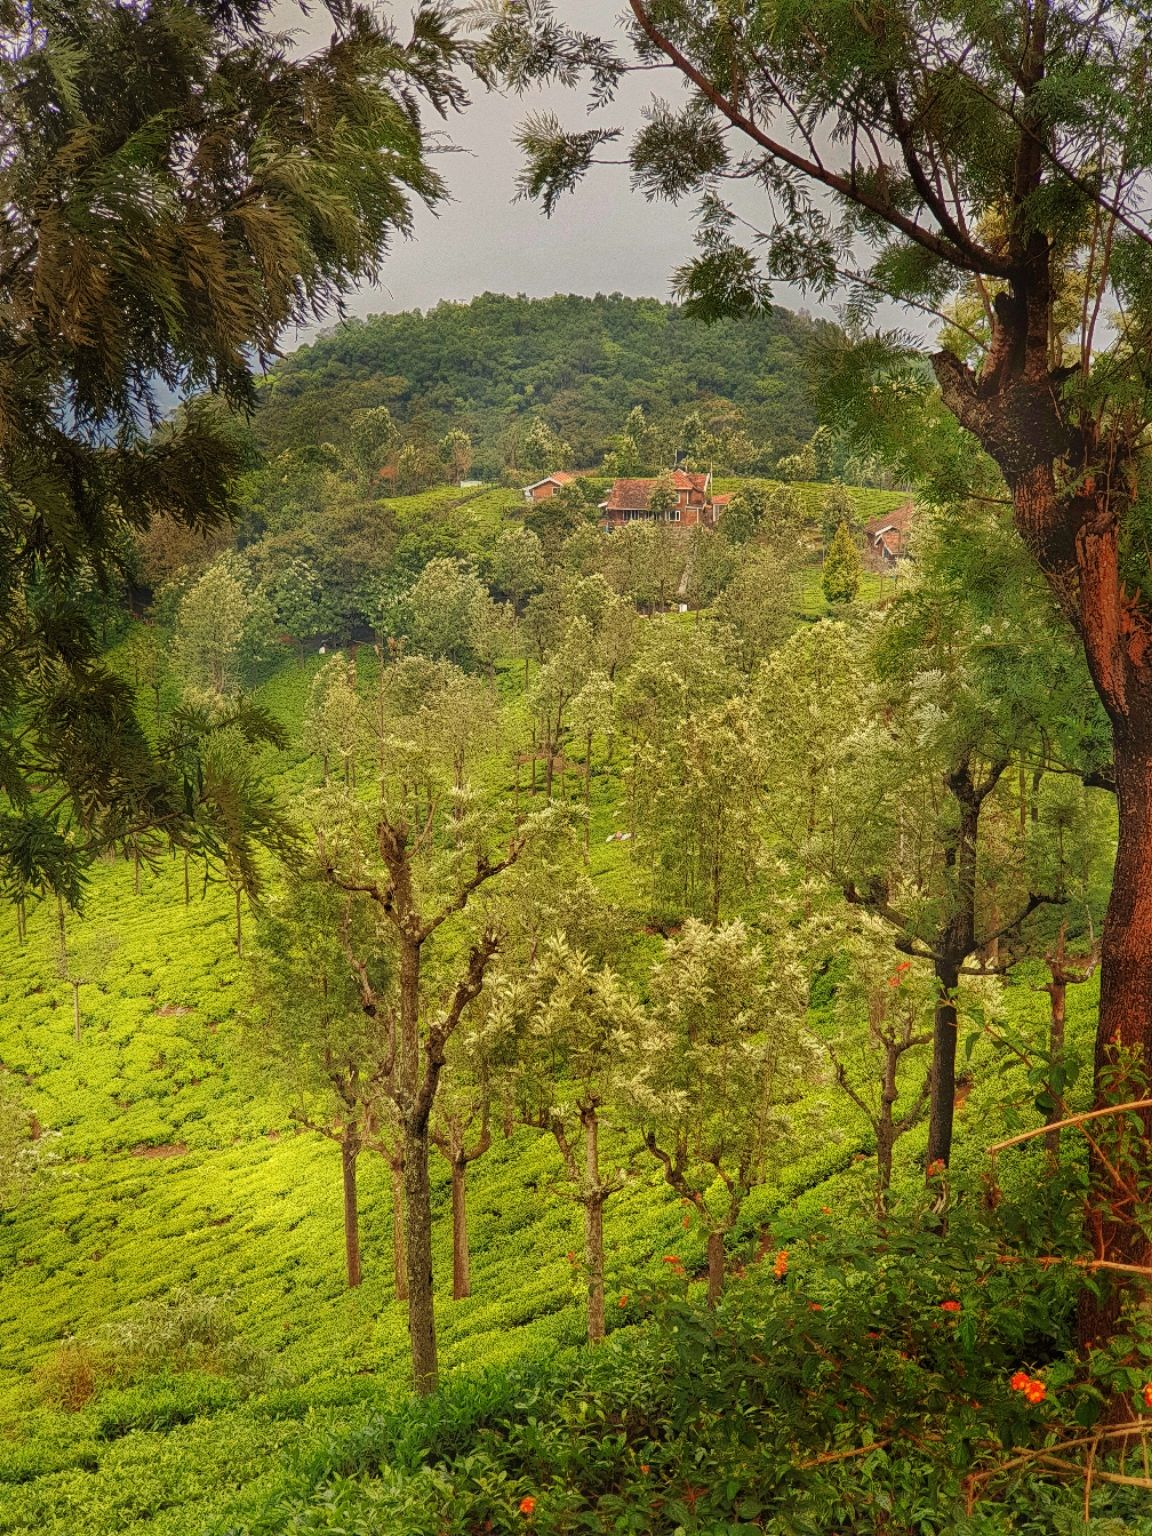 Photo of Coonoor Tea Estate By Avijit Sharma